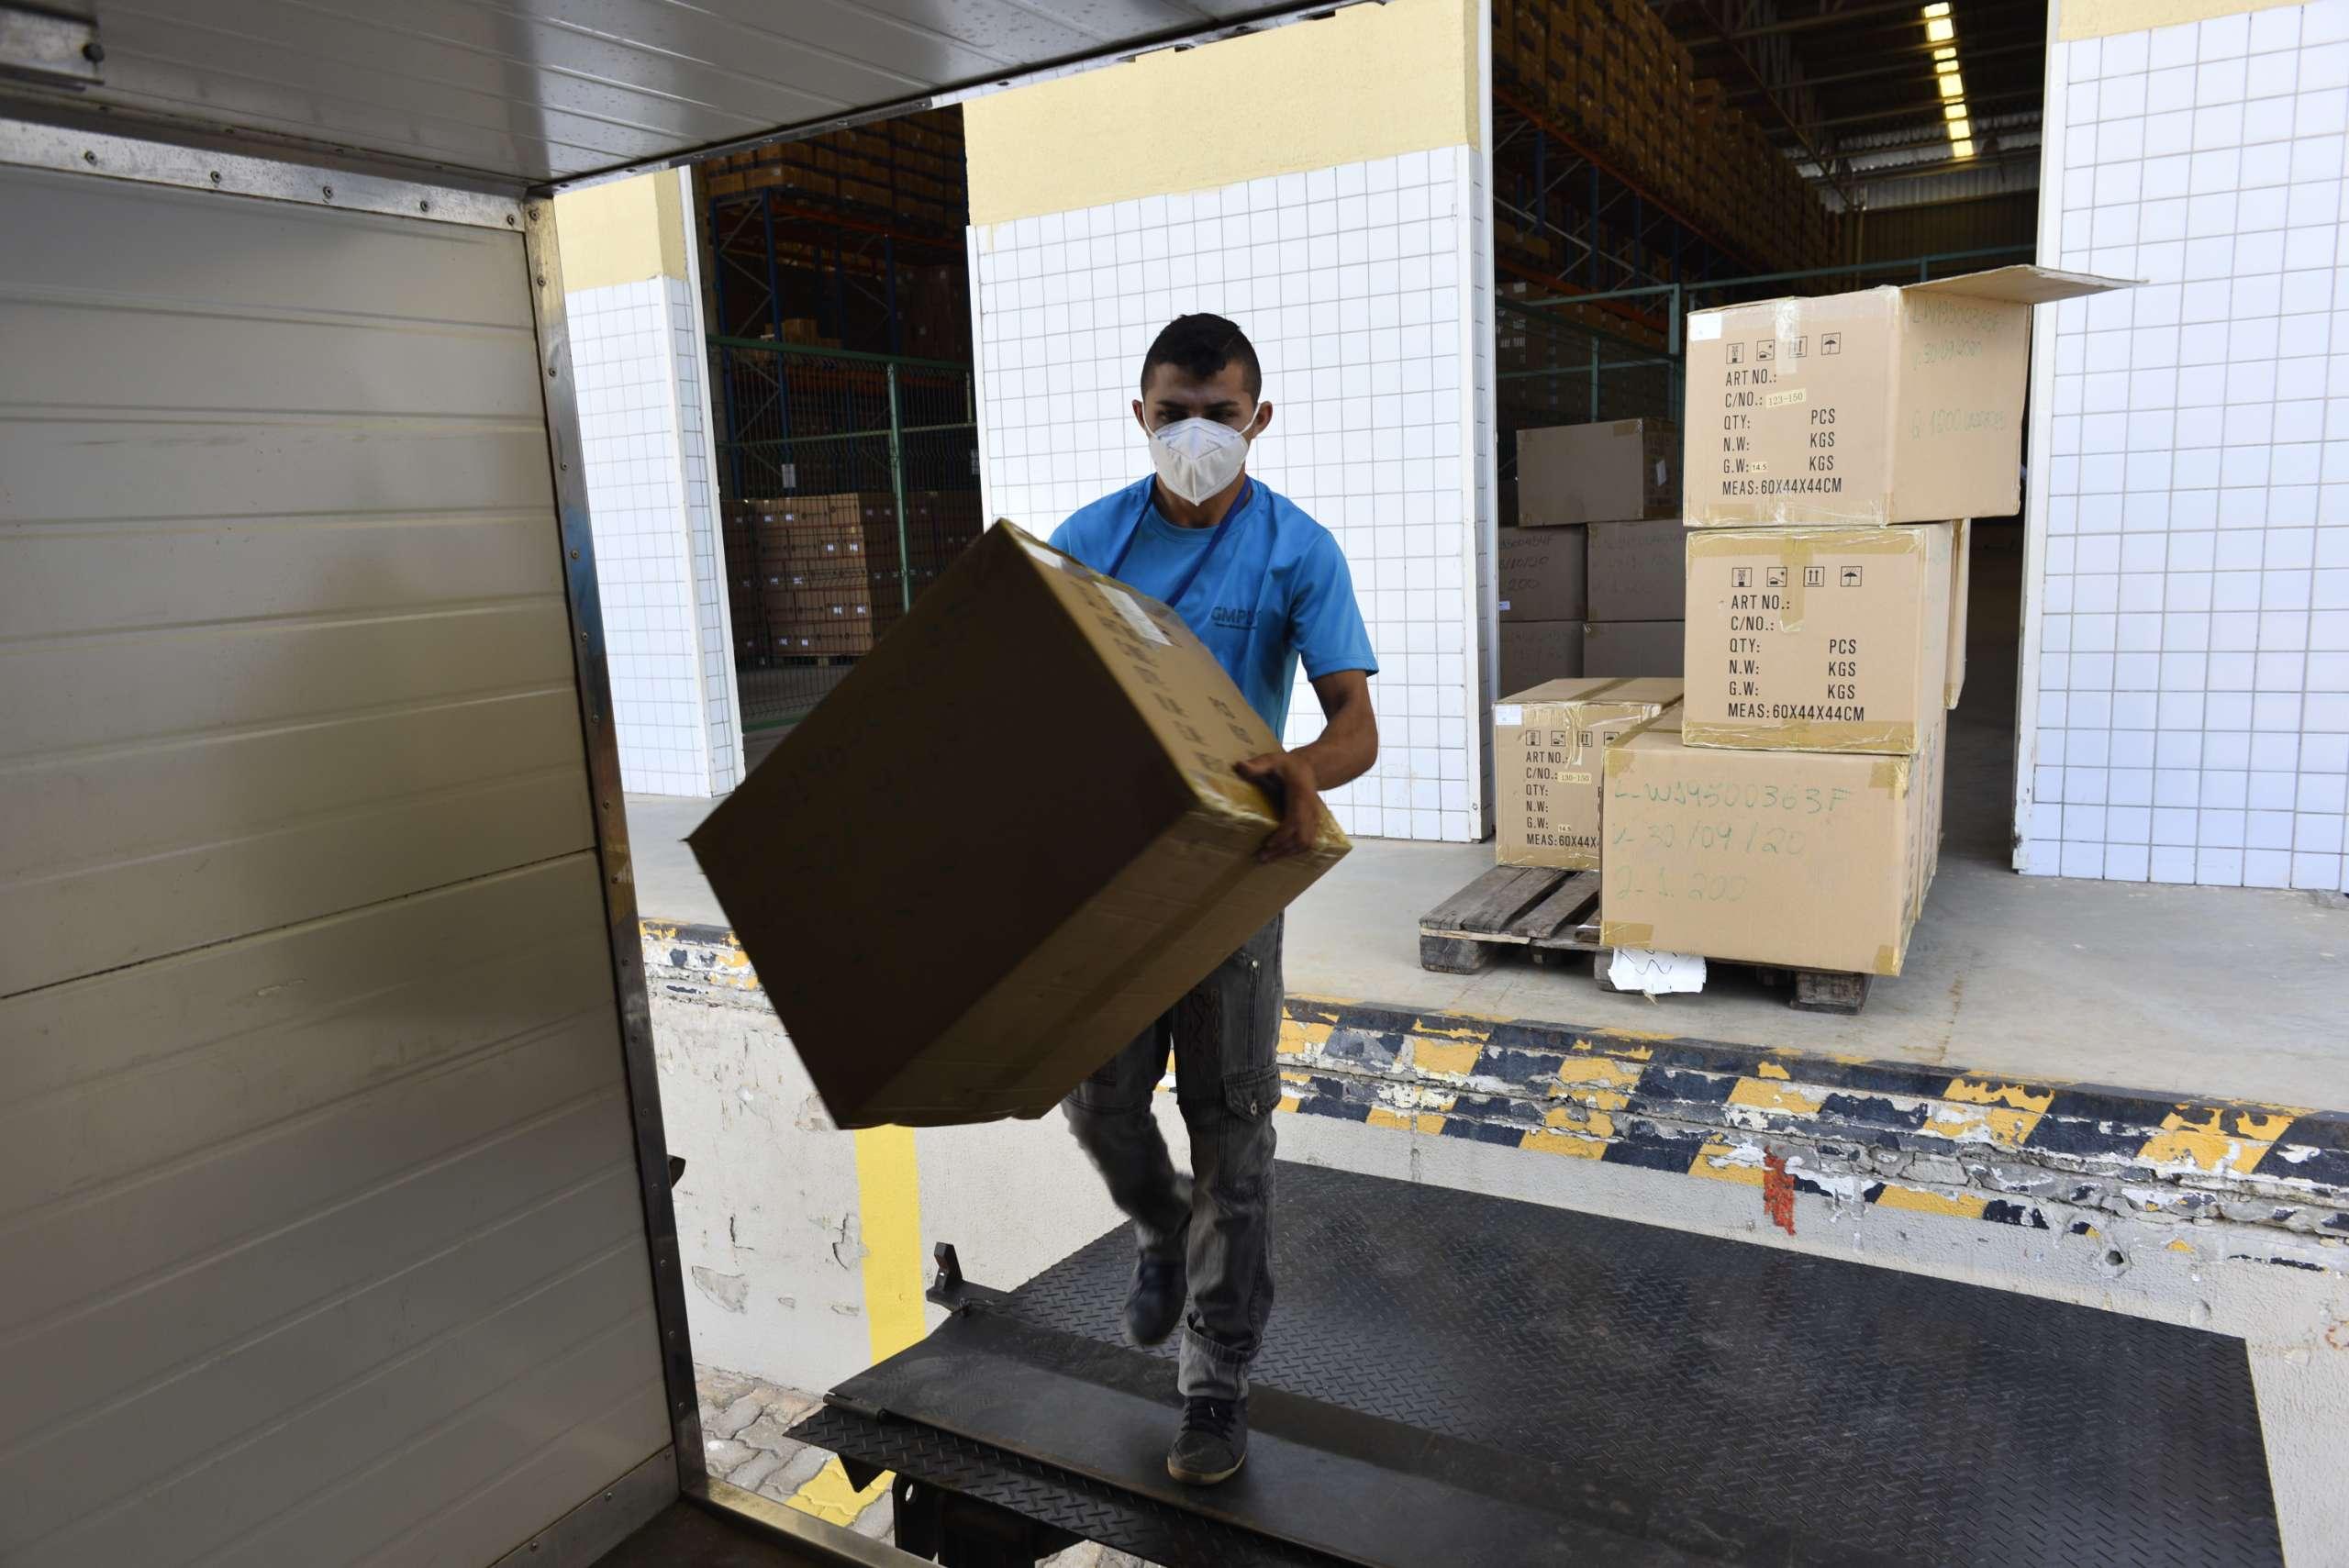 Ceará – Decreto amplia ferramentas de combate a fraudes fiscais